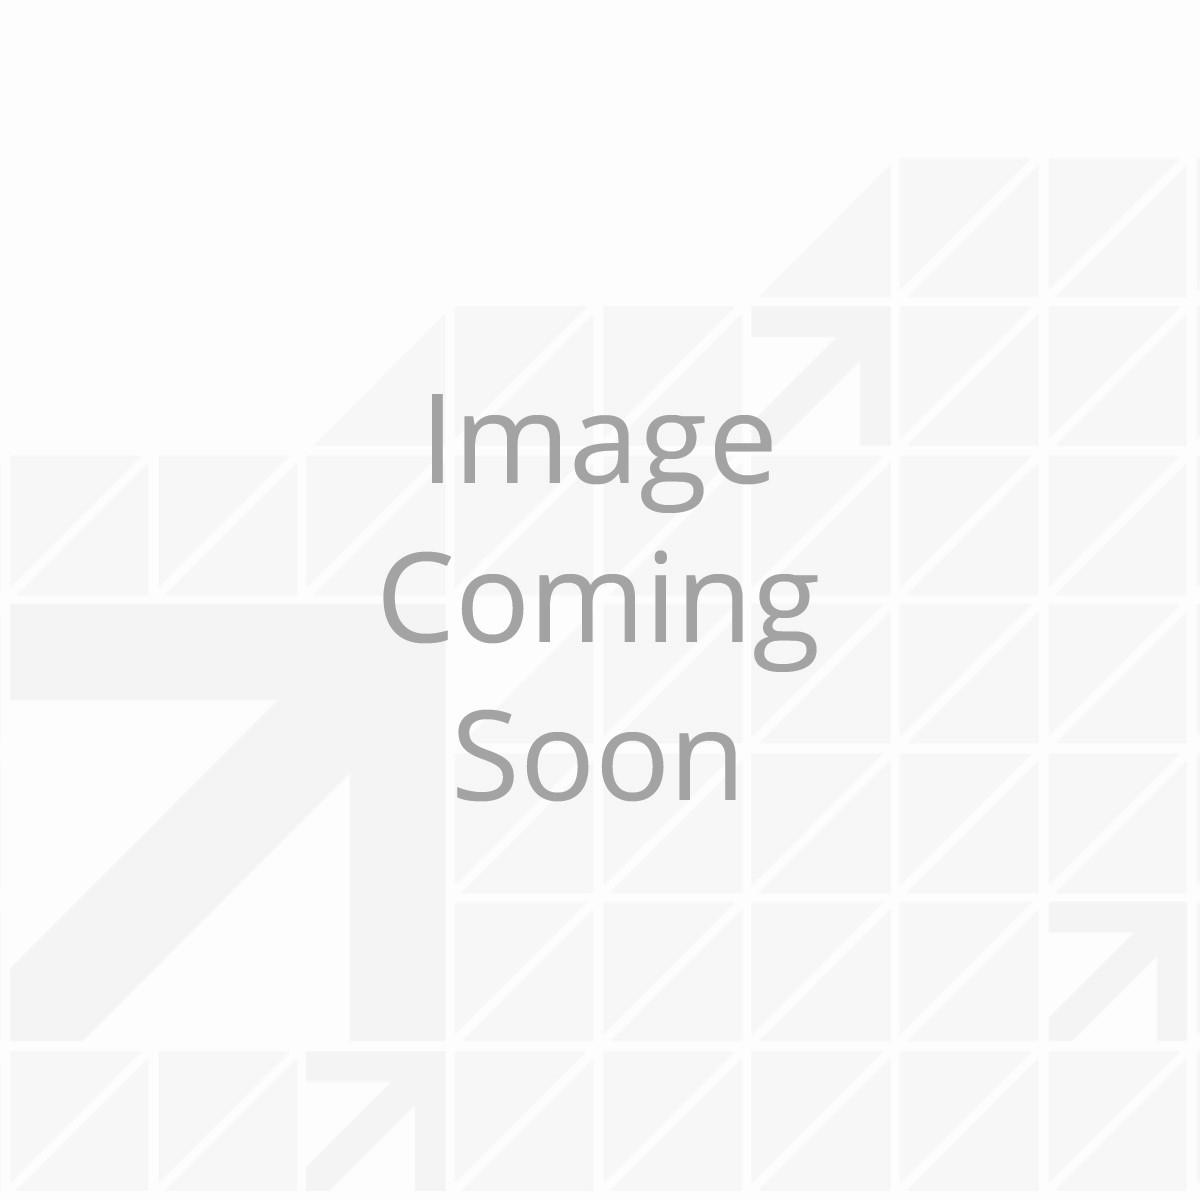 Oil/Grease Cap - 8,000 lbs. Screw-In Hub-and-Rotors Disk Brakes